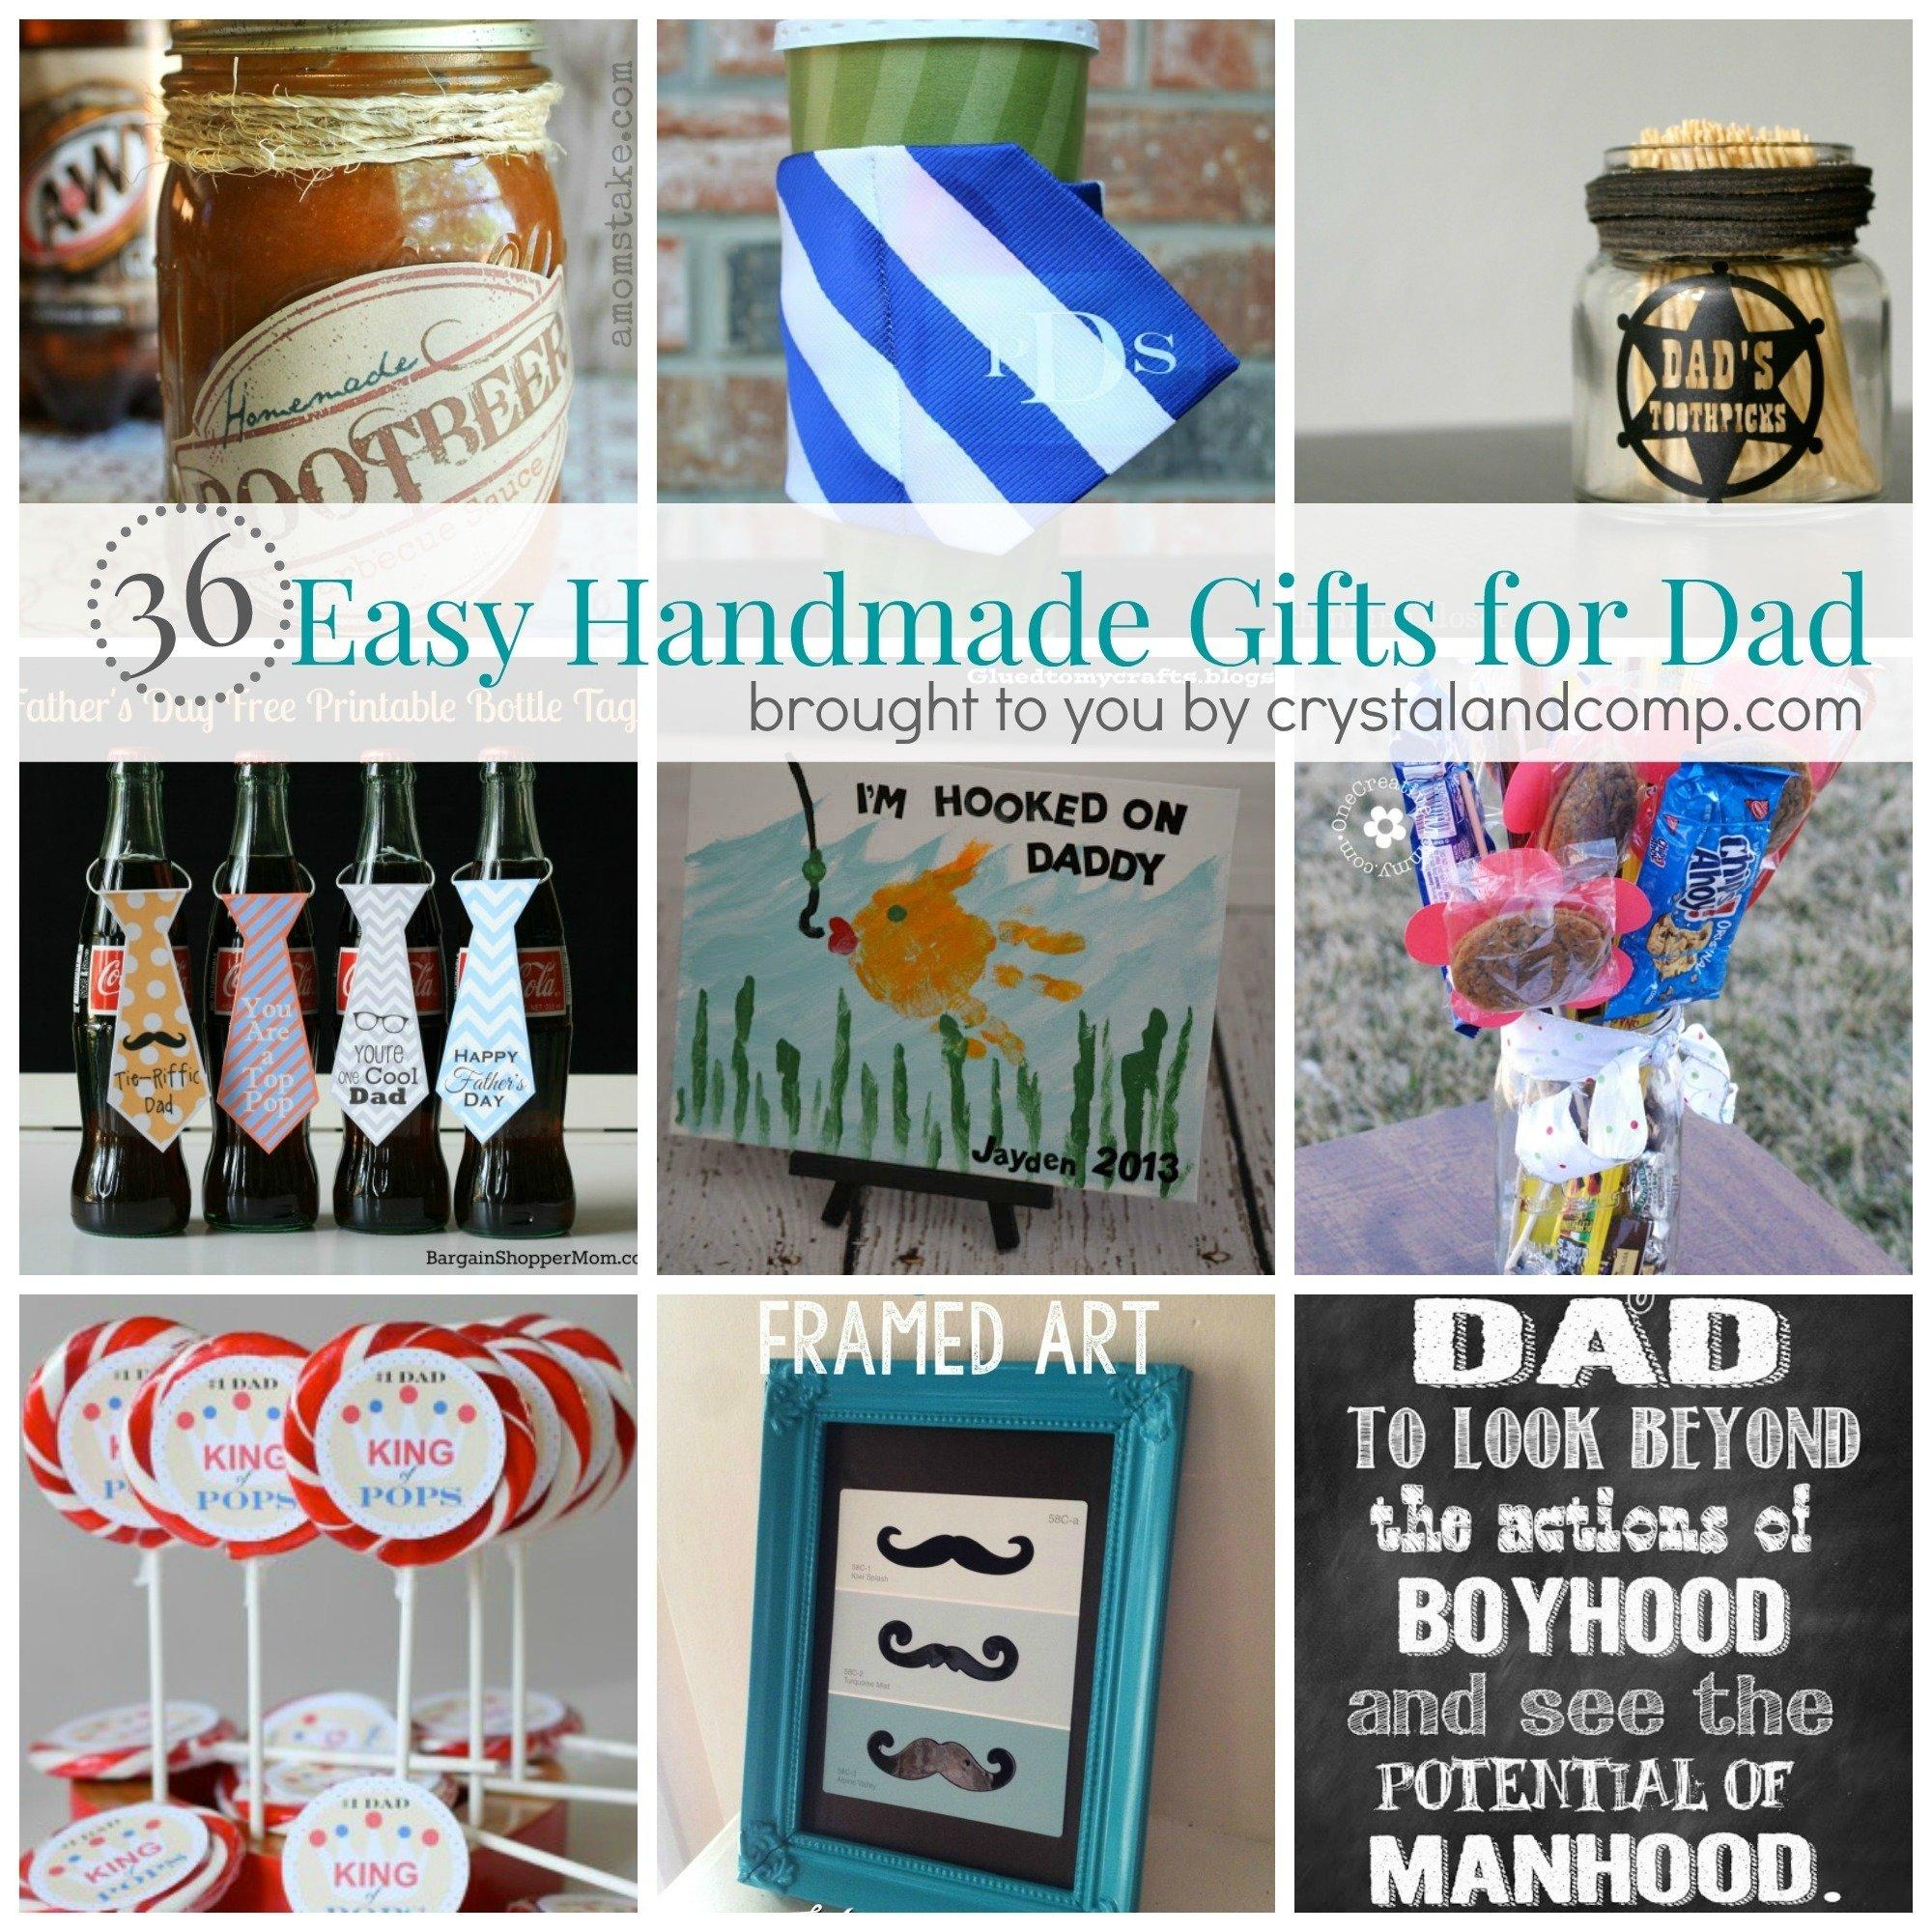 10 Nice Ideas For Dad For Christmas 36 easy handmade gift ideas for dad easy homemade gifts dads and 16 2020